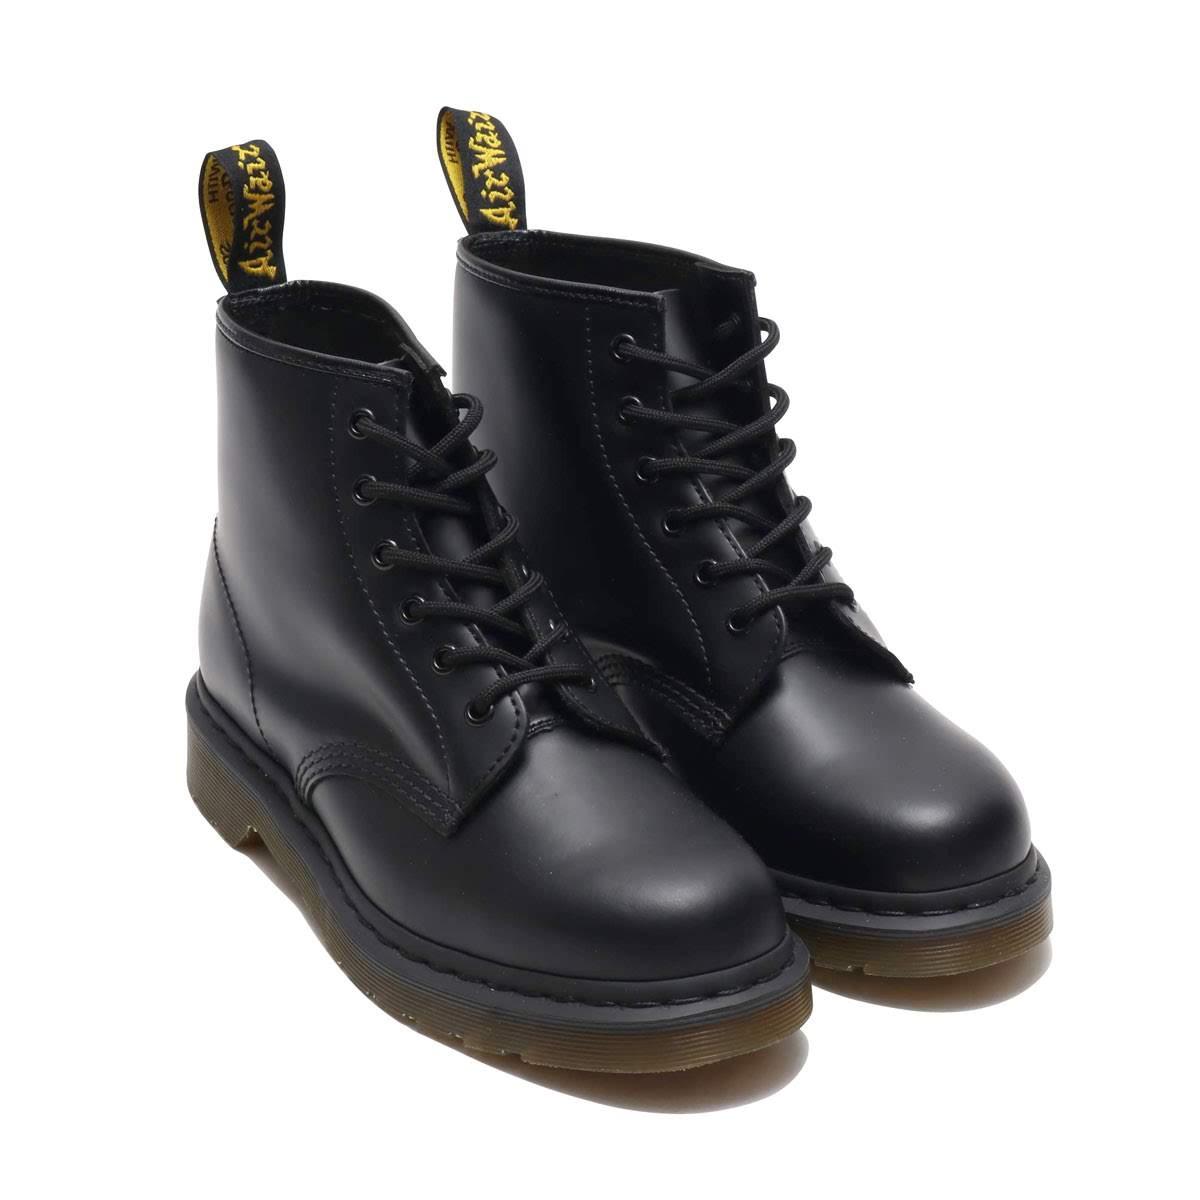 Dr.Martens 101 6EYE BOOT (ドクターマーチン 101 6アイ ブーツ)BLACK【メンズ レディース ブーツ】19SS-I